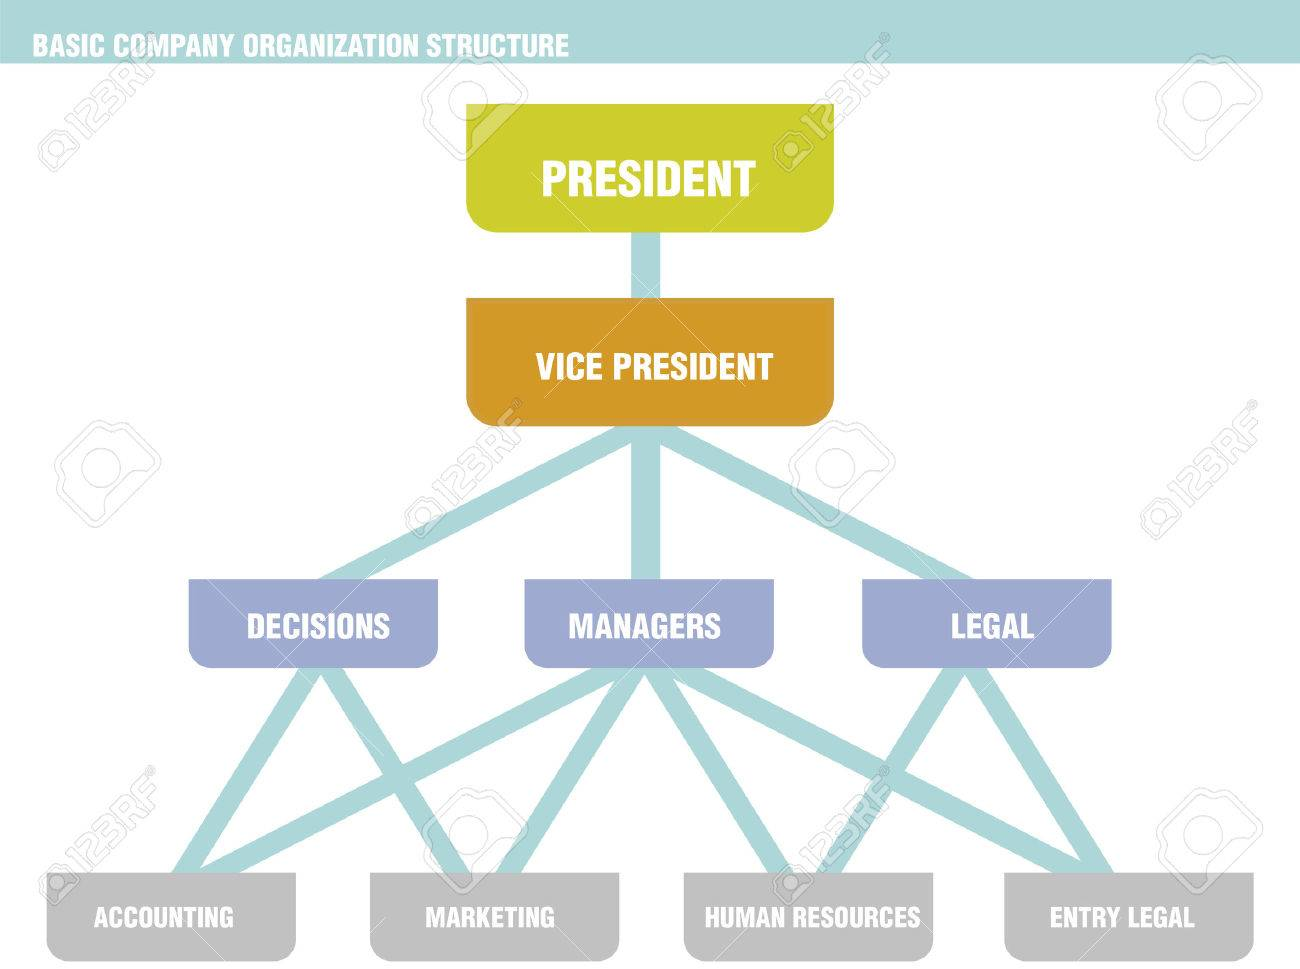 hewlett packard organizational structure